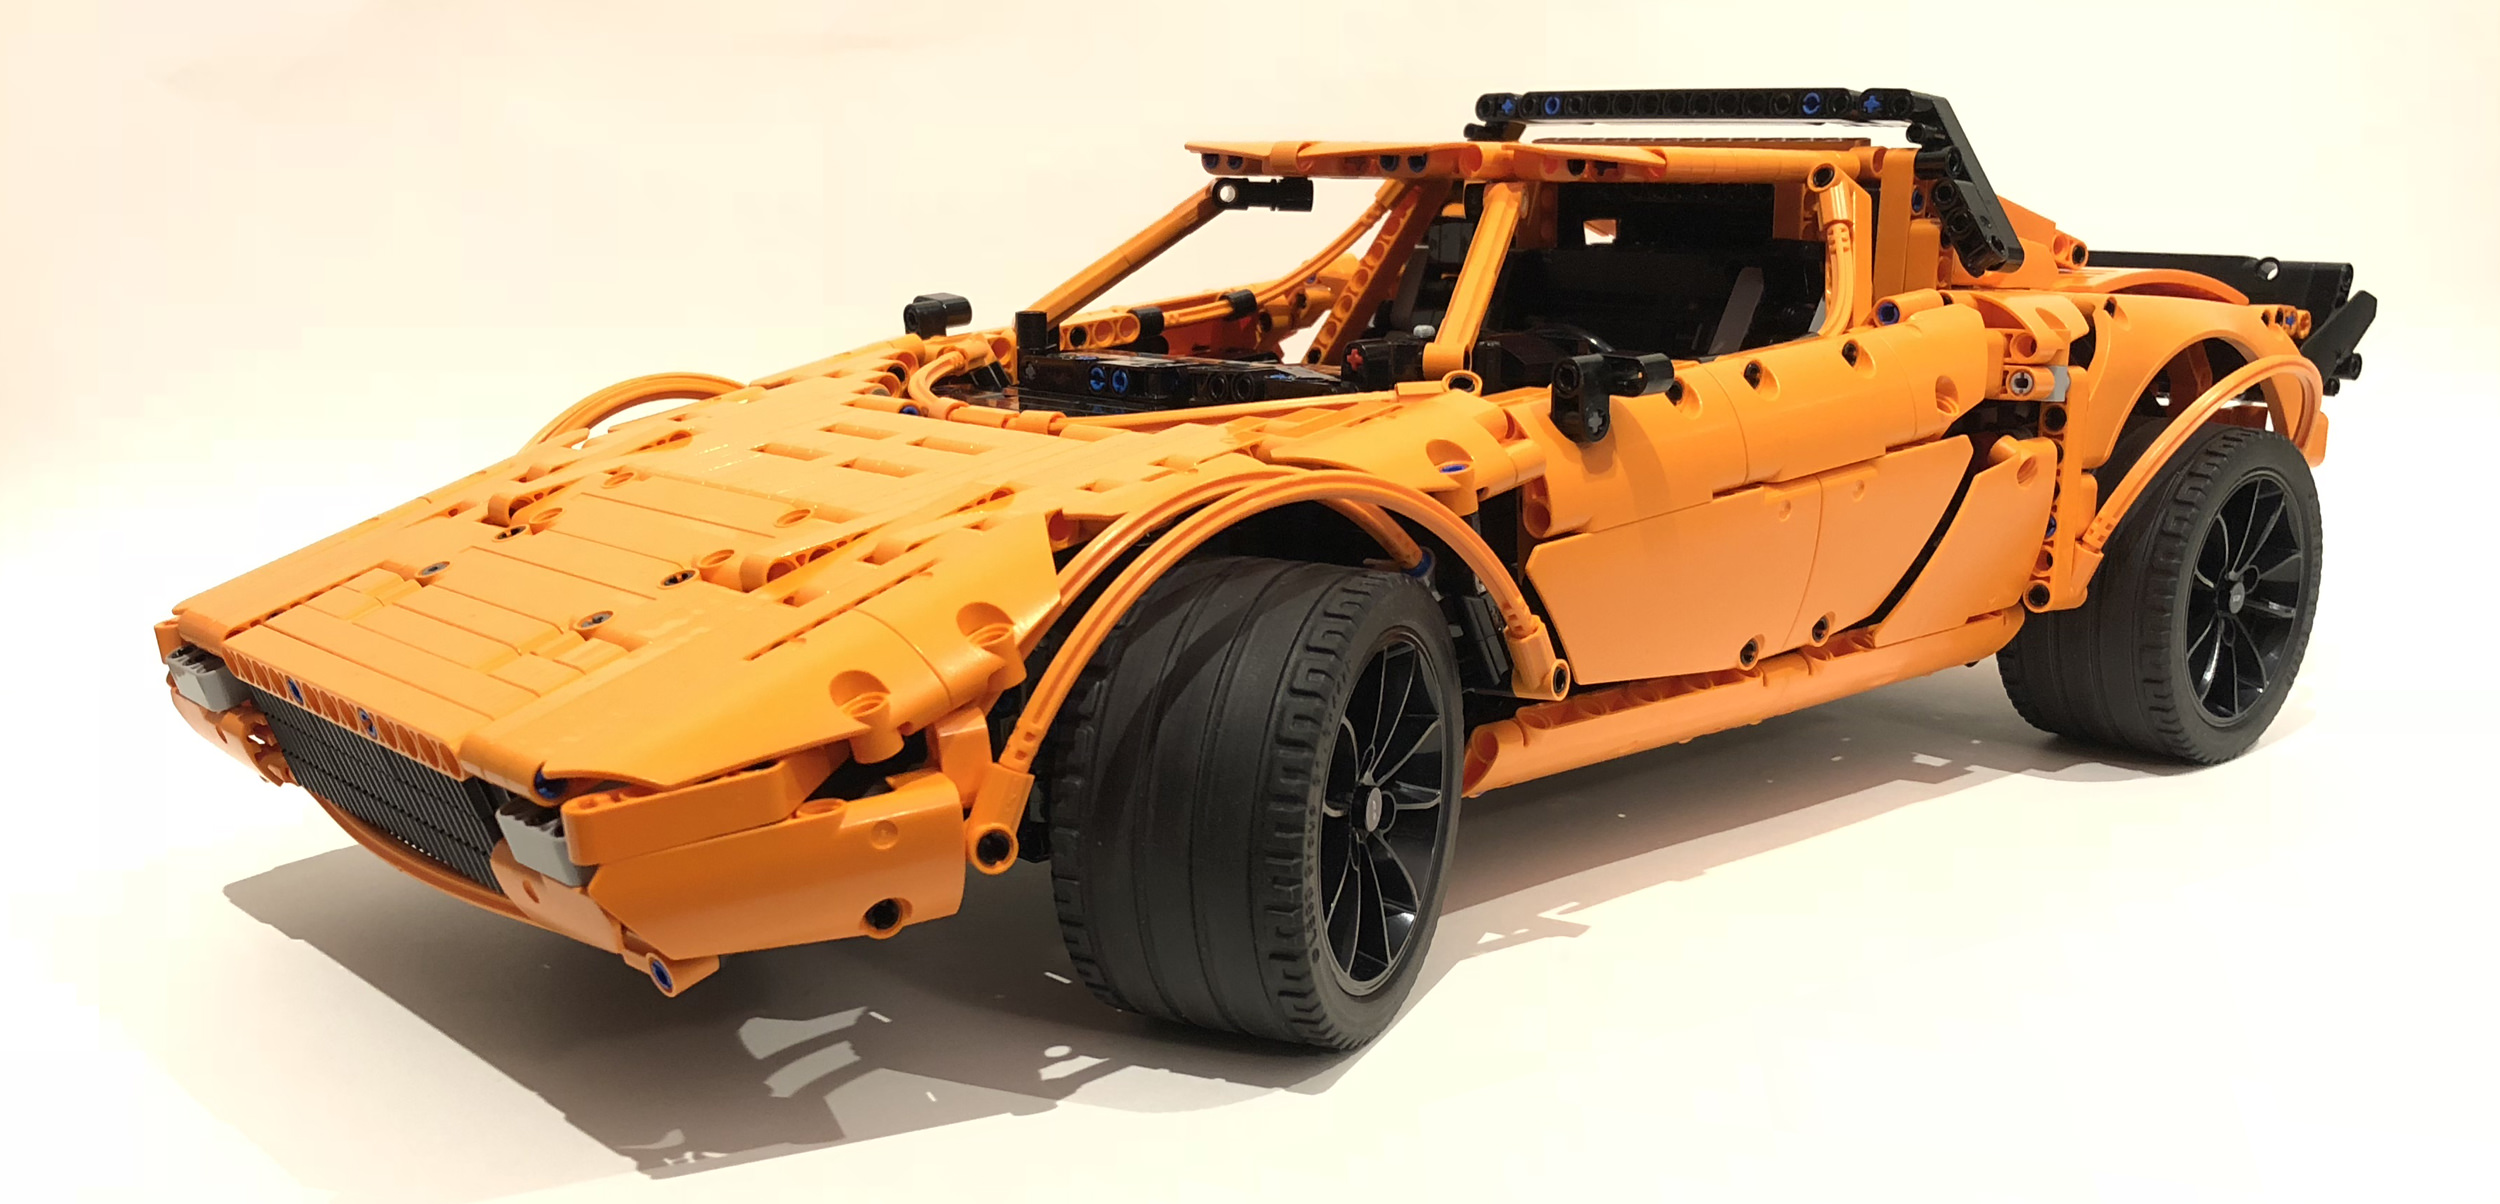 Lego Technic Lancia Stratos Porsche GT3 RS kit (4)